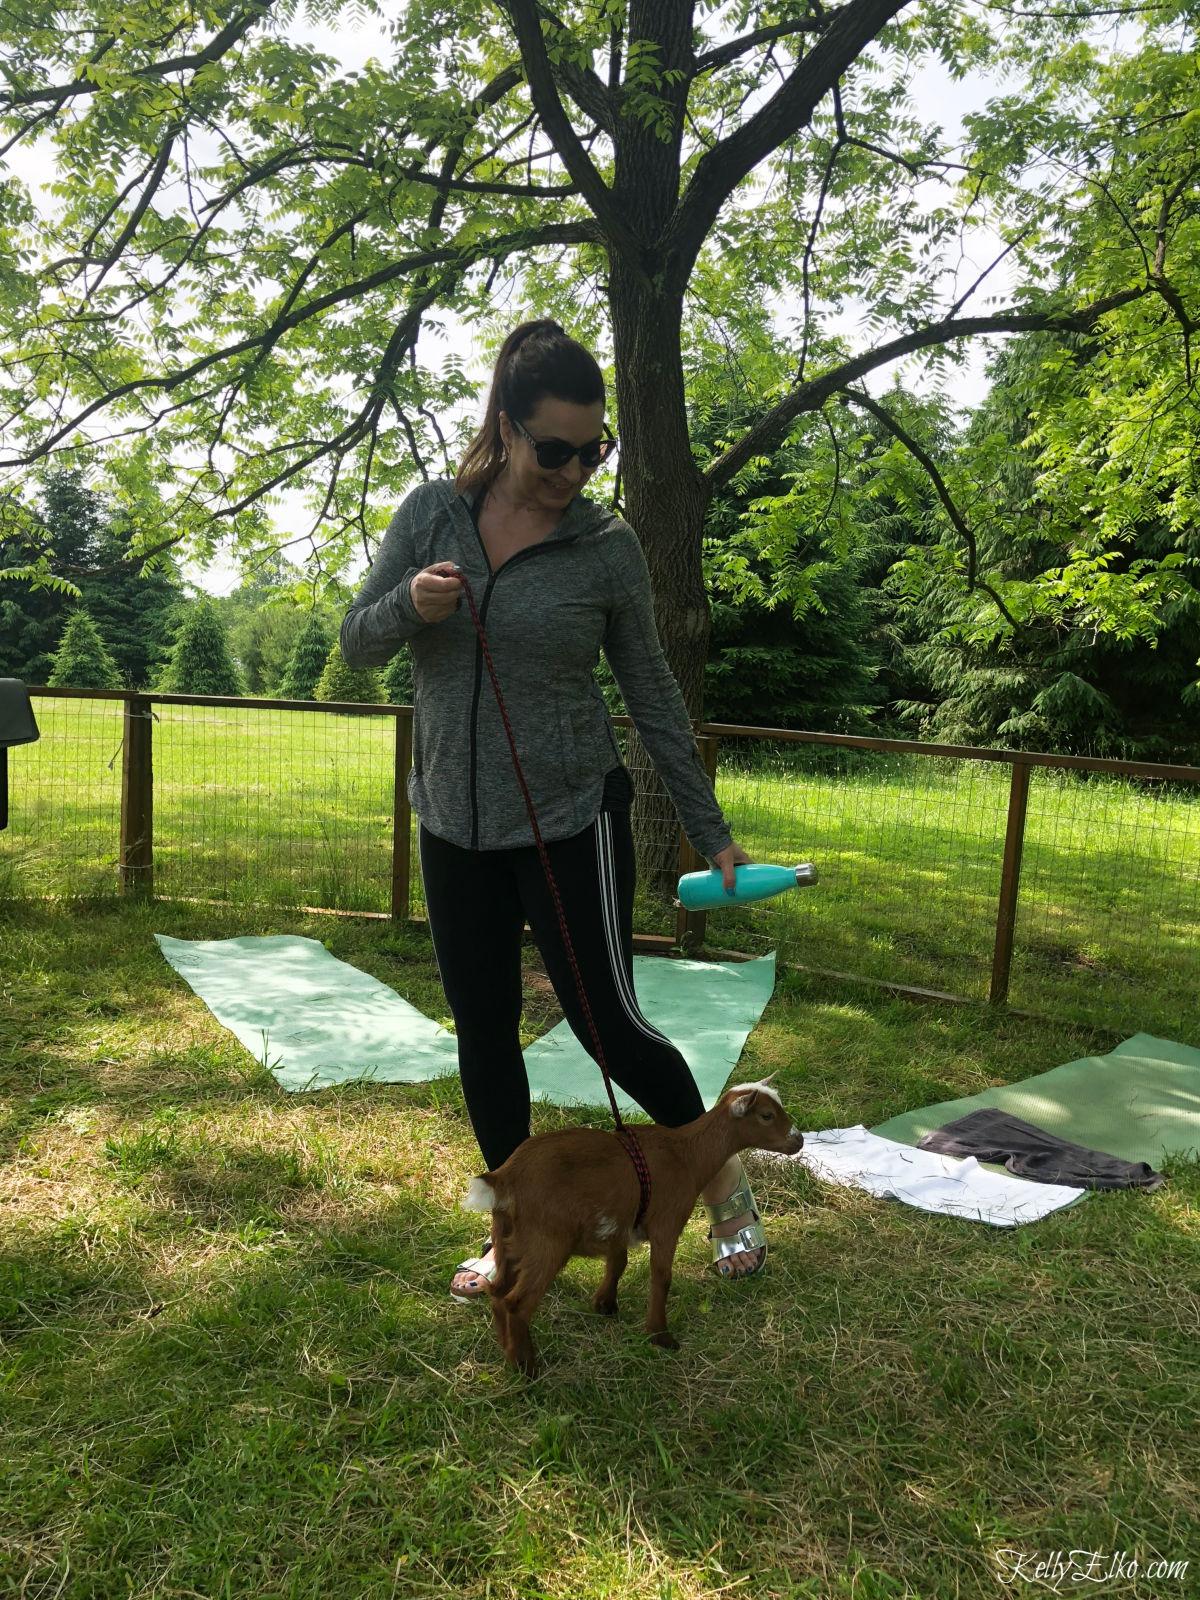 Goat yoga is such a fun experience! kellyelko.com #goatyoga #yoga #goats #pygmygoats #52weeksofyes